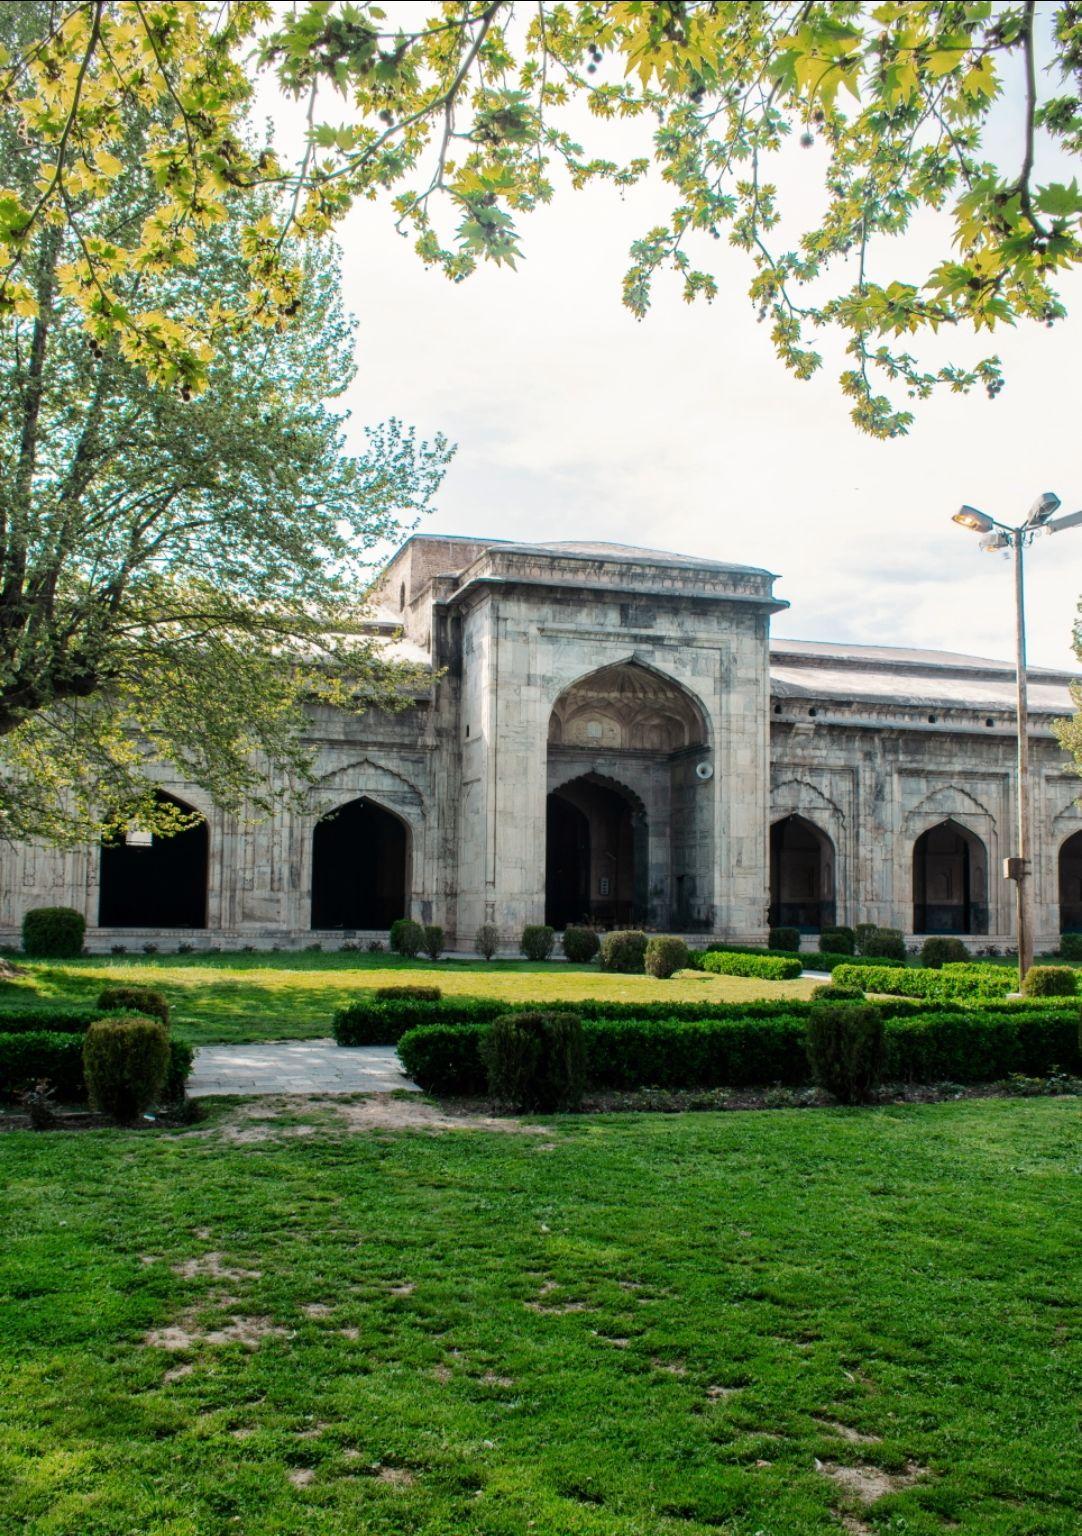 Photo of Pathar Masjid By Shah Shais